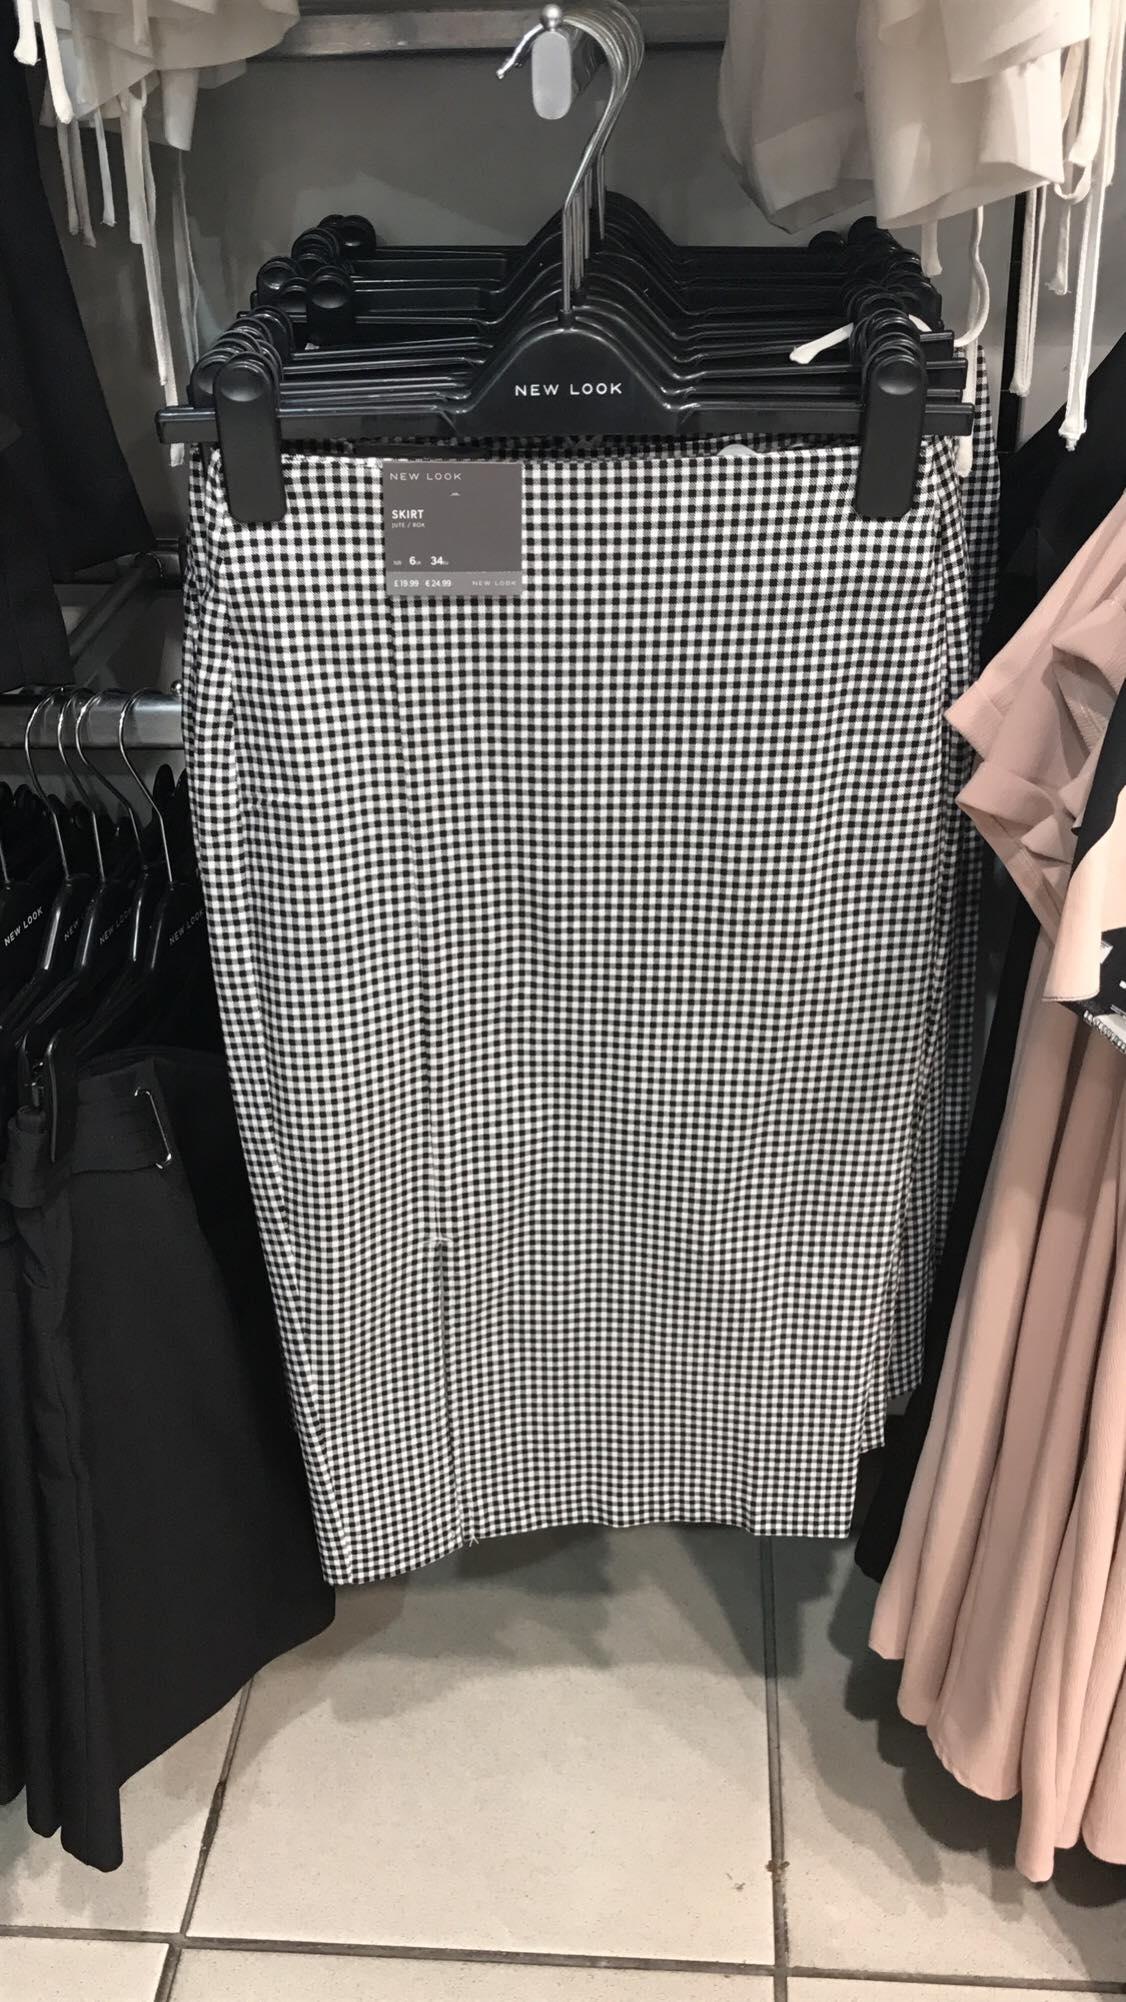 New Look Sale